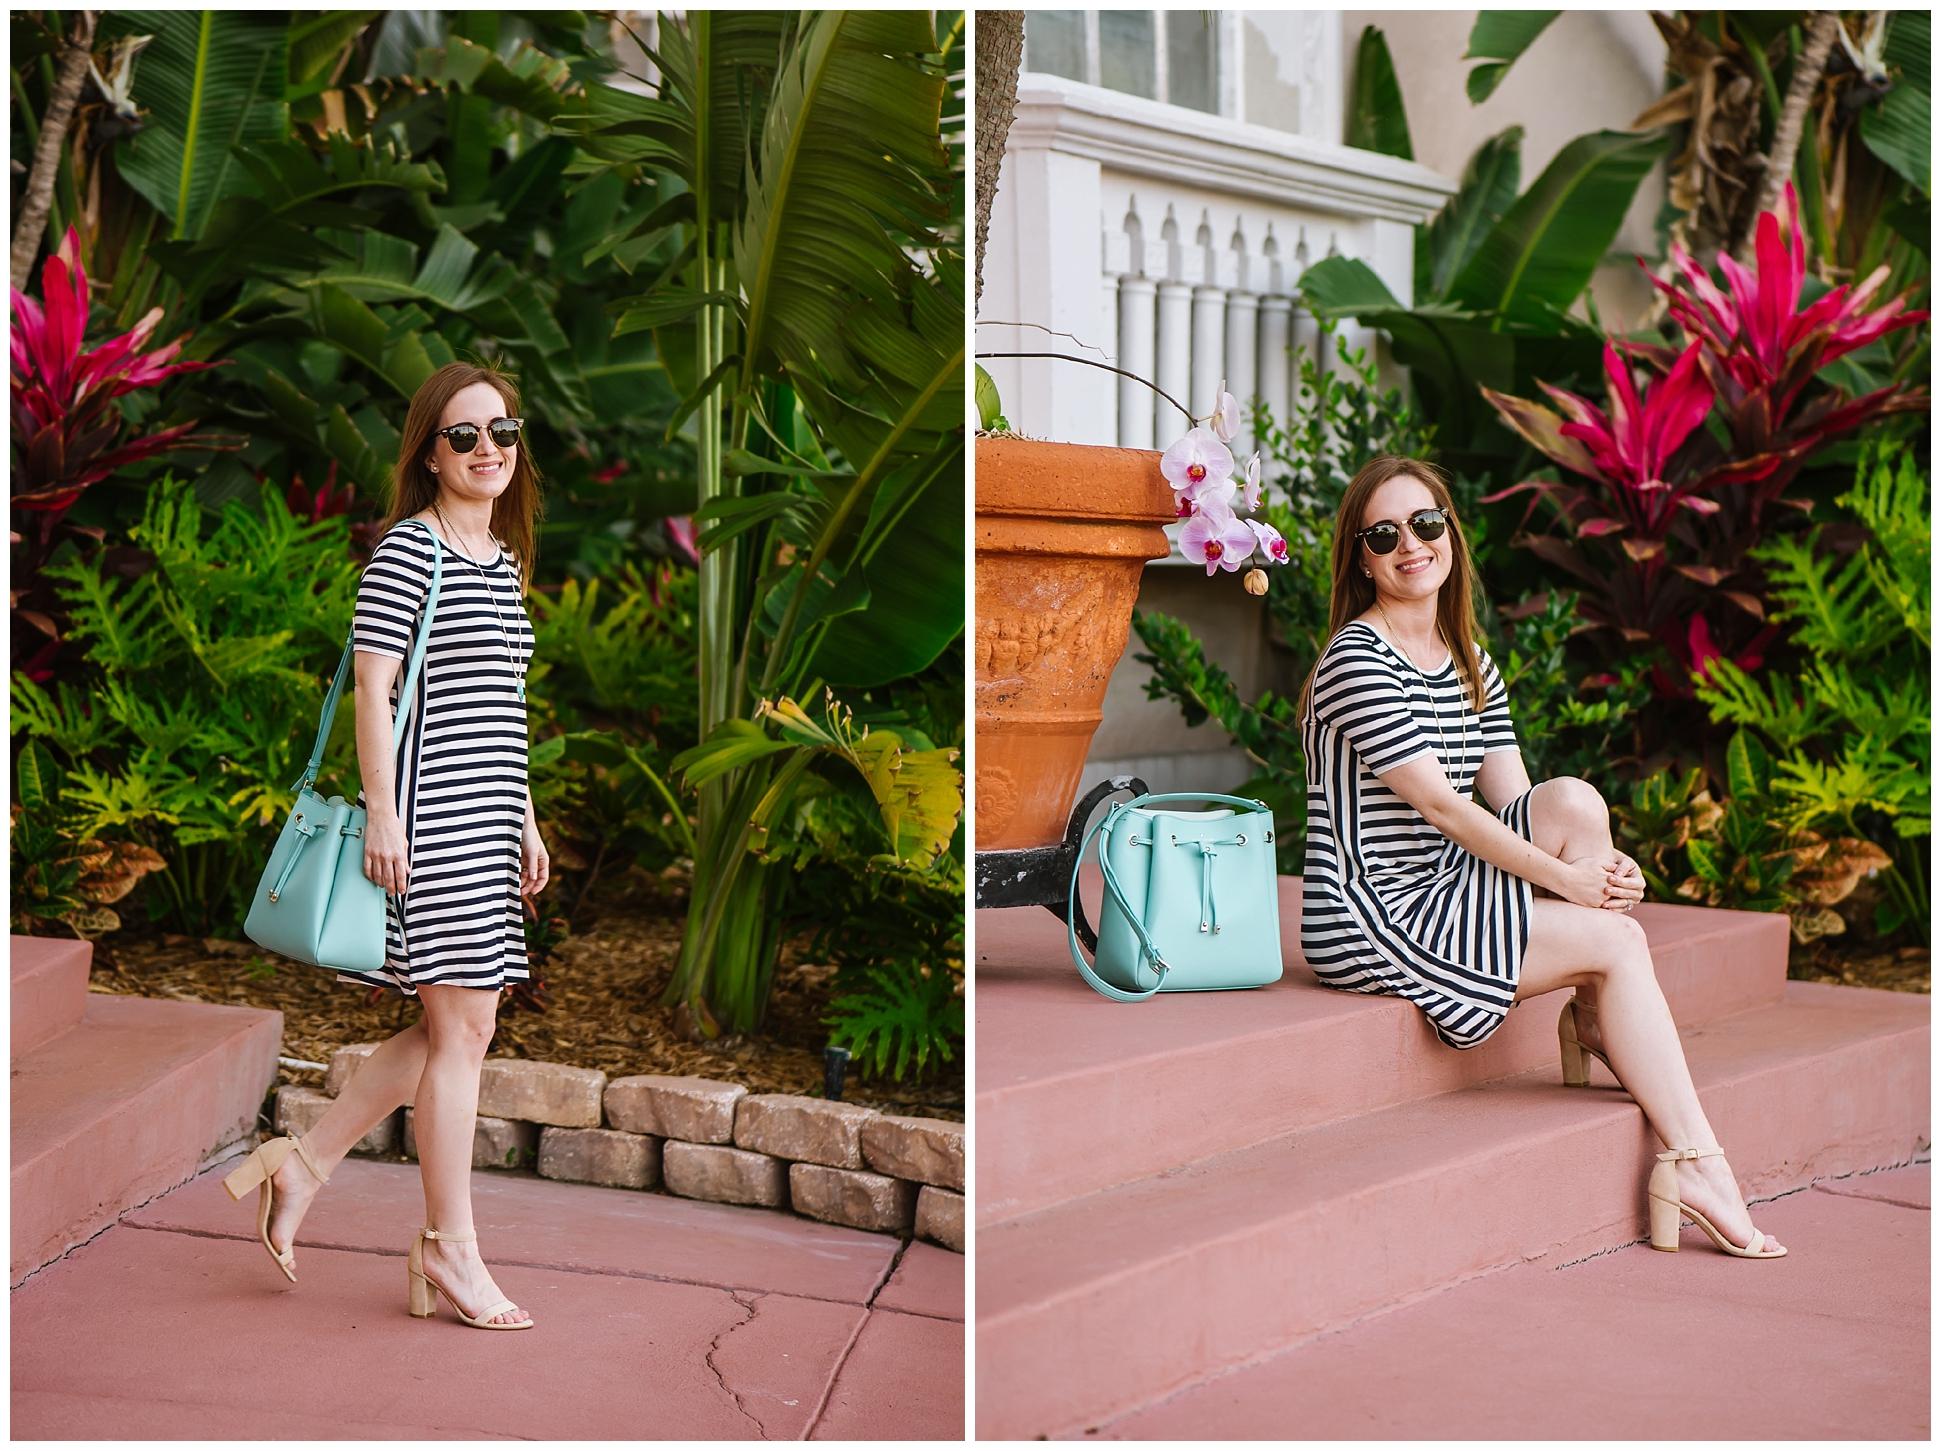 Tampa-lifestyle-bradning-fashion-blogger-photographer_0039.jpg